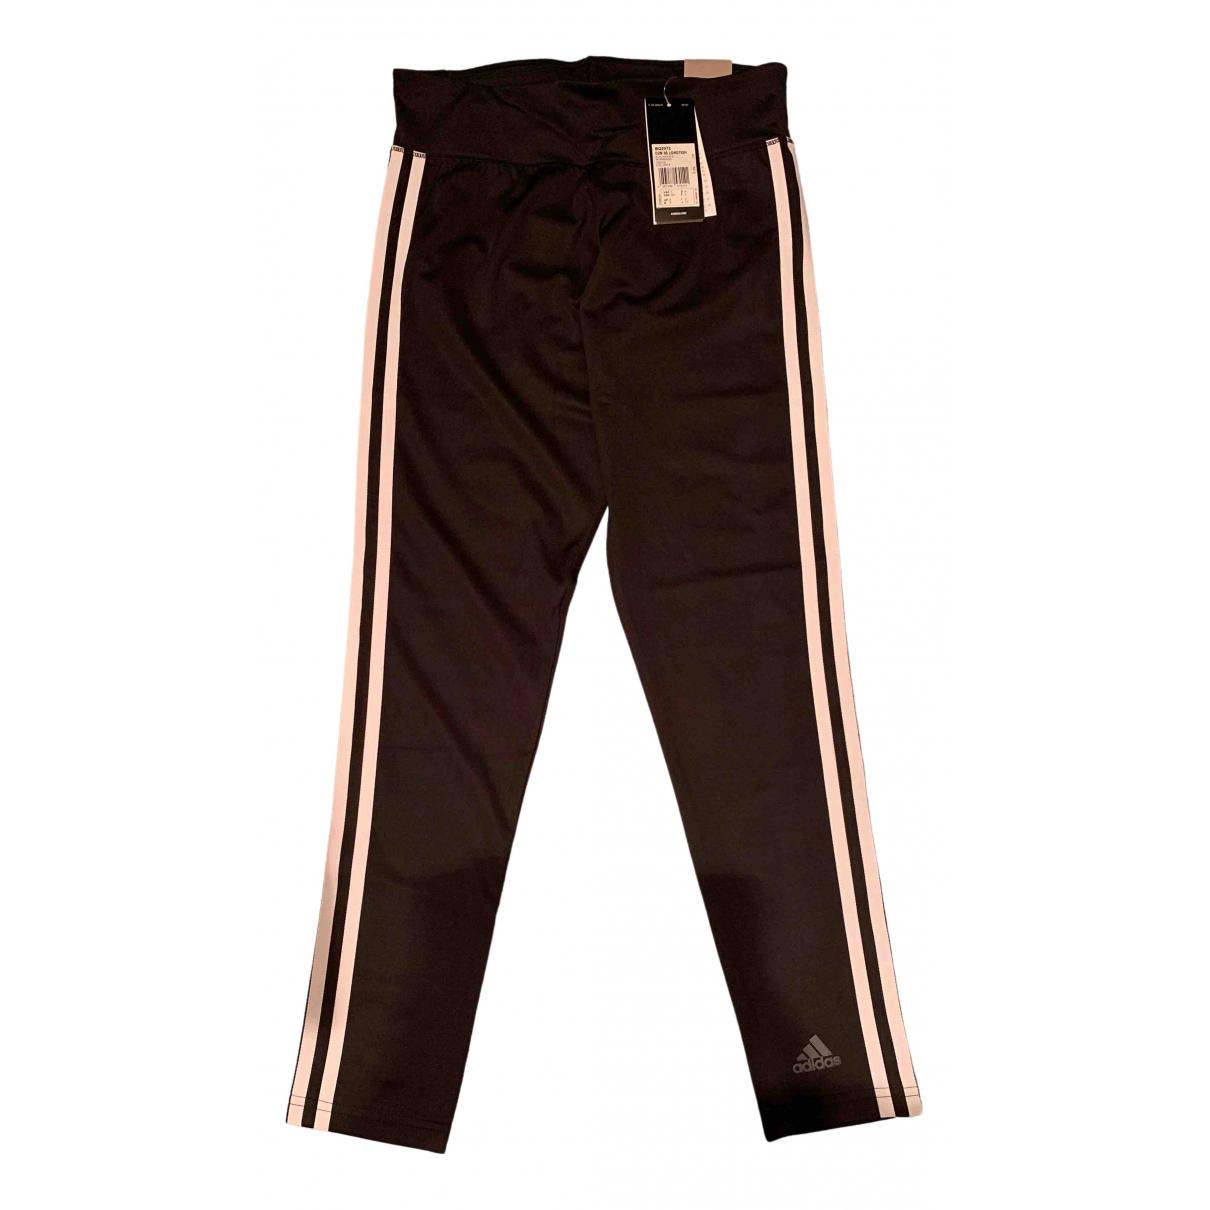 Adidas \N Black Trousers for Women S International